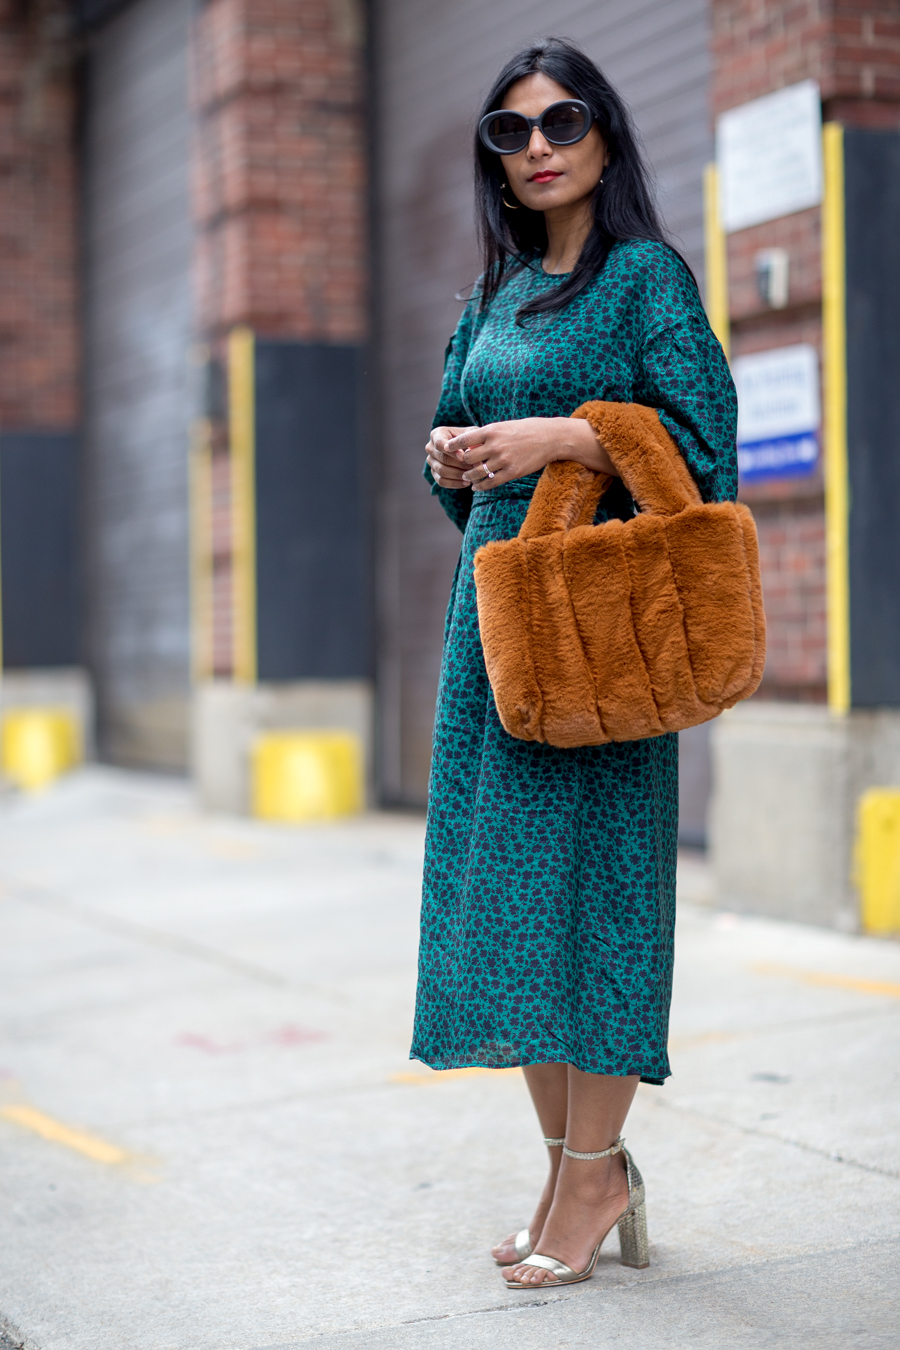 winter style, teddy coats, petite fashion, petite style, boston fashion, mom style, womens fashion, midi dresses, pear shape, boston blogge